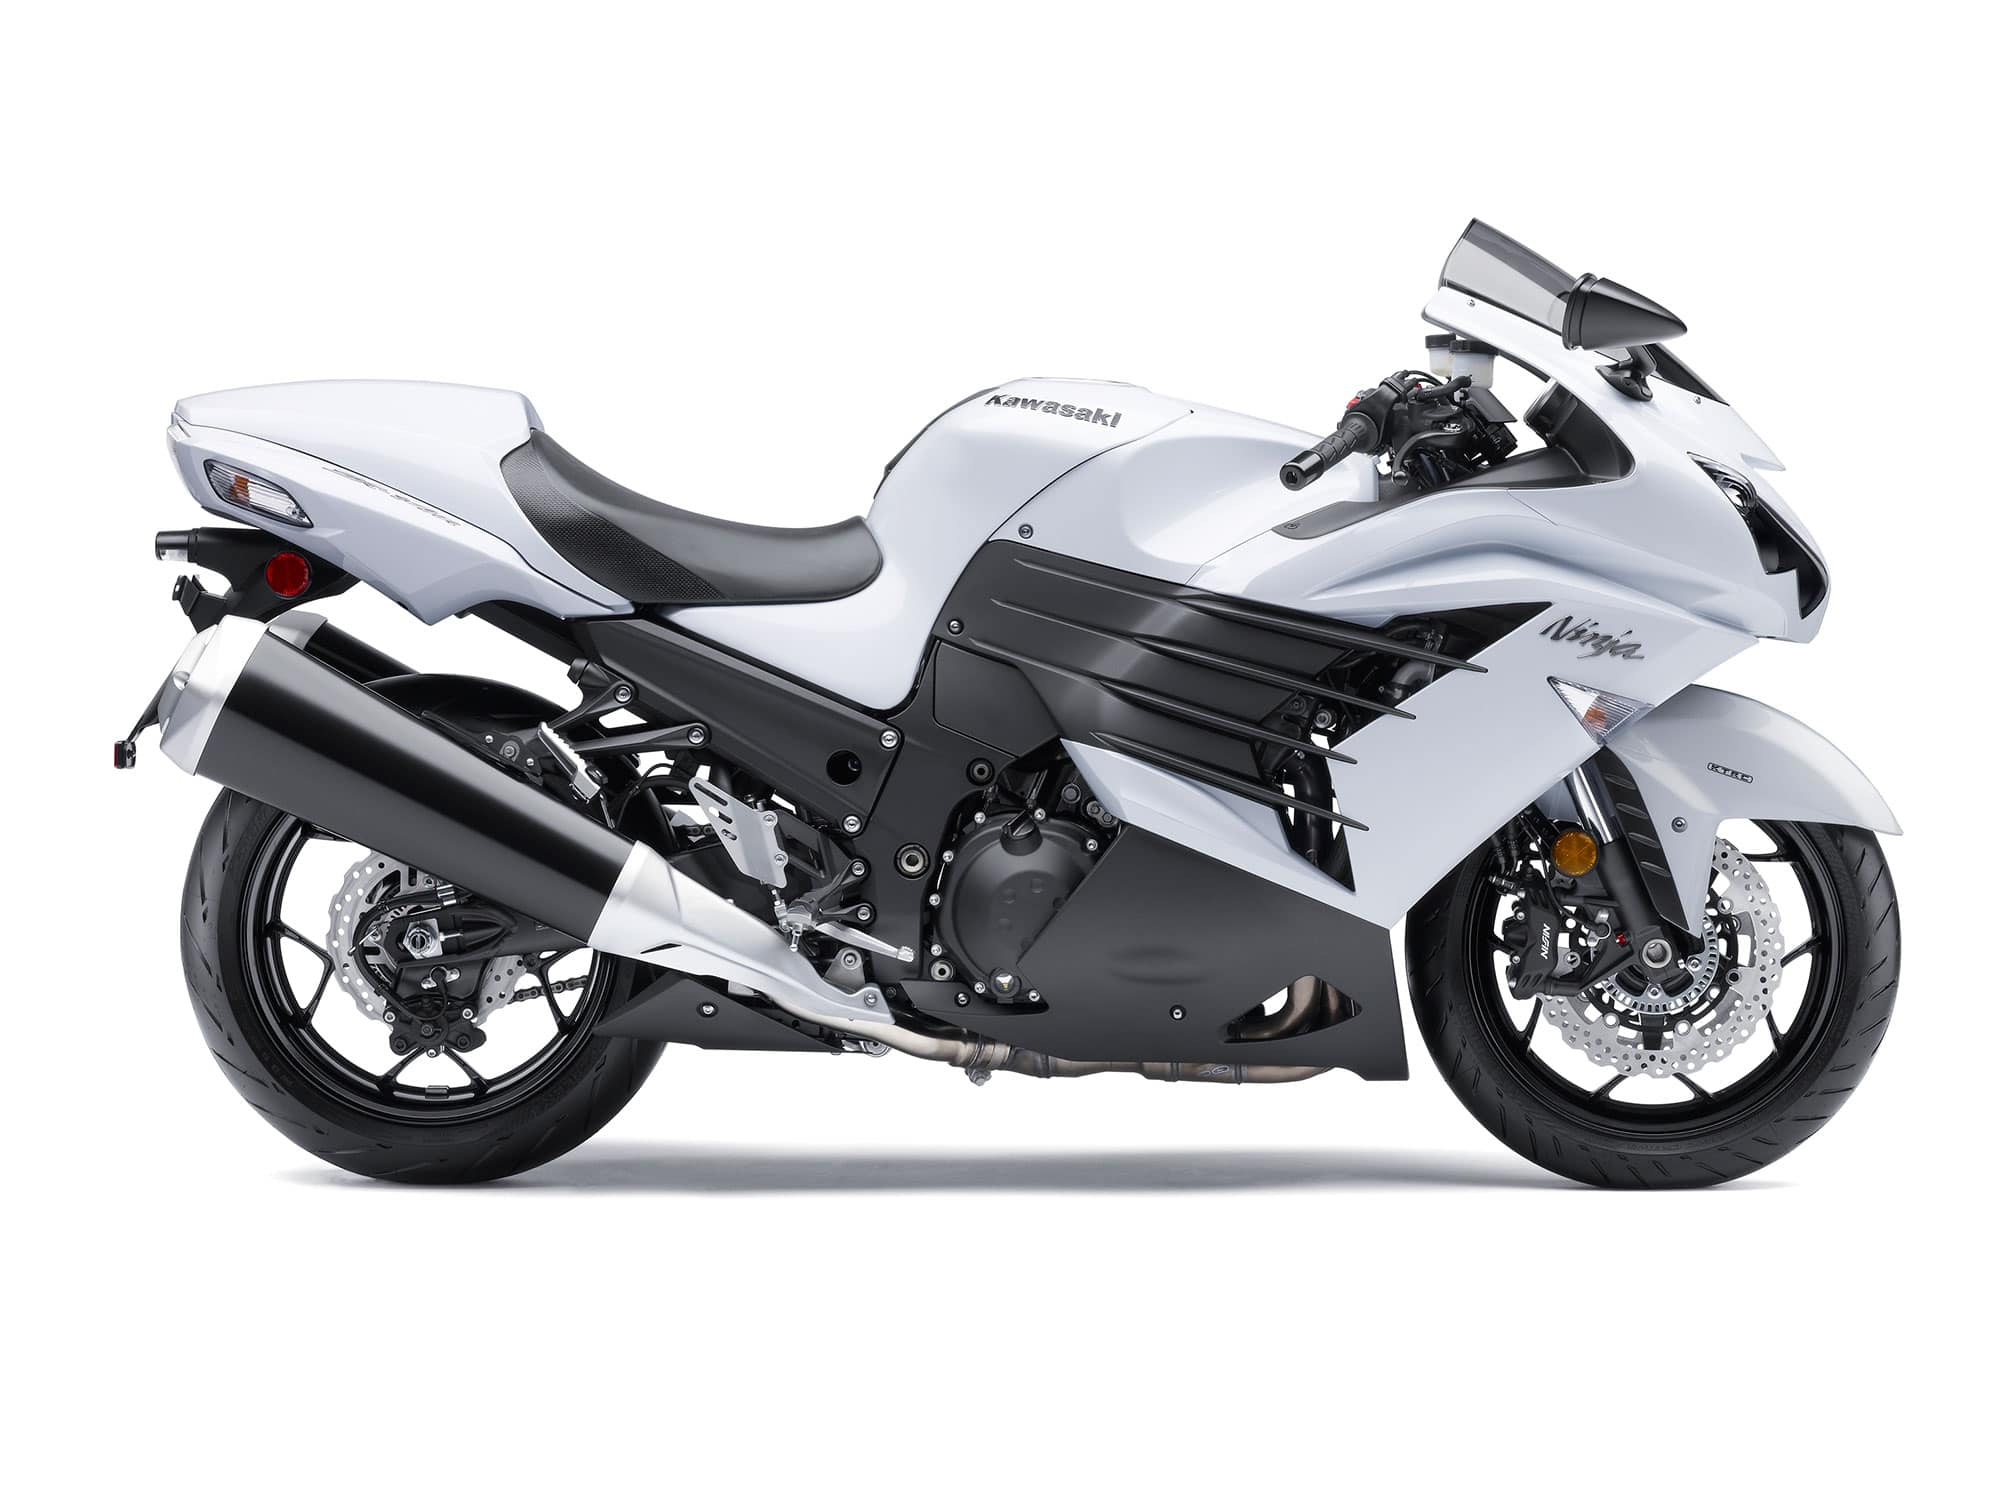 2012 Kawasaki Ninja ZX-14R Widescreen for desktop